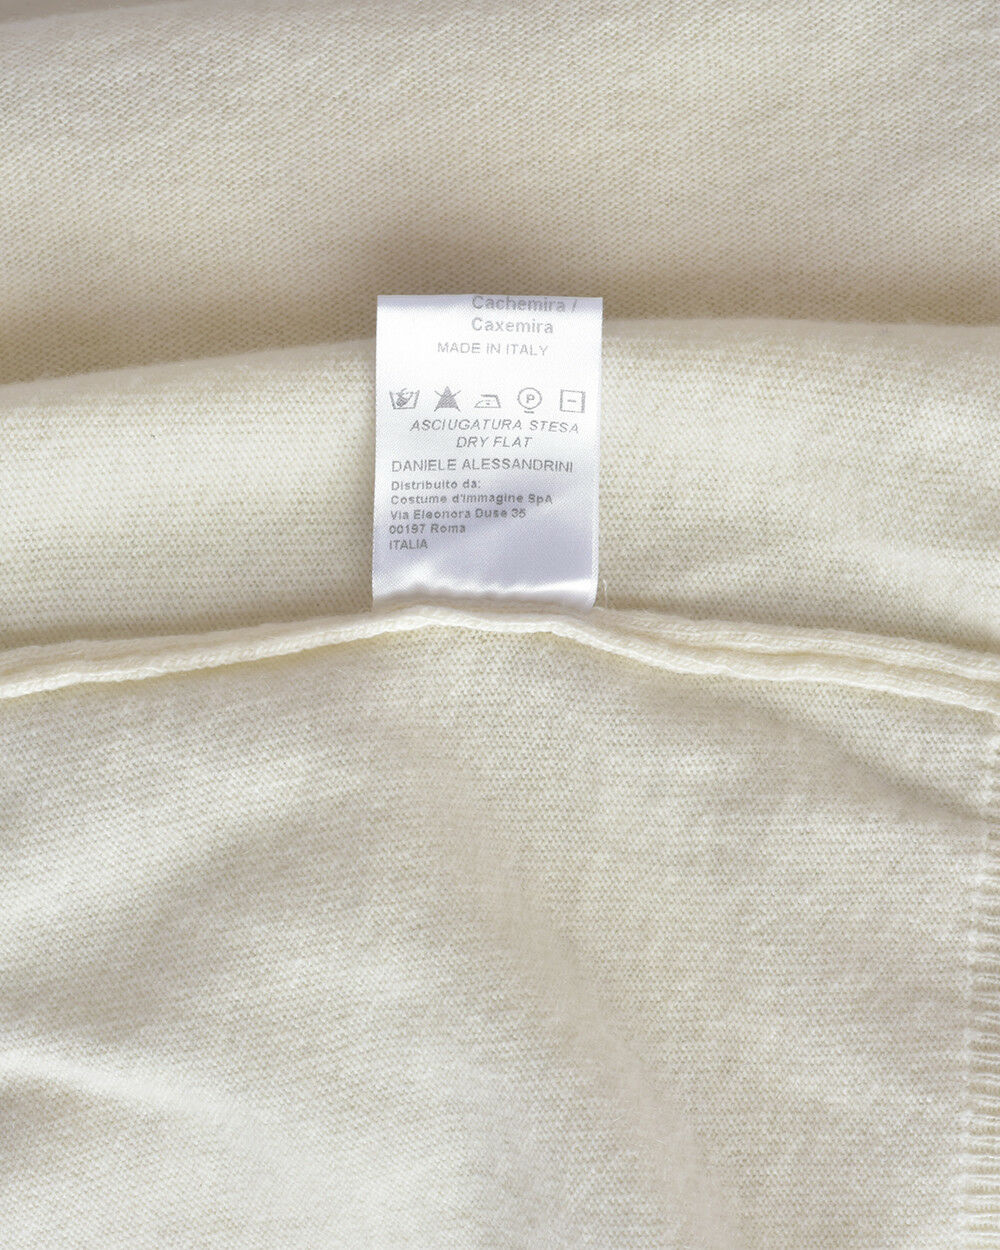 Maglia Maglione Daniele FM31220D3706 Alessandrini Sweater Lana Uomo Panna FM31220D3706 Daniele 12 04897b